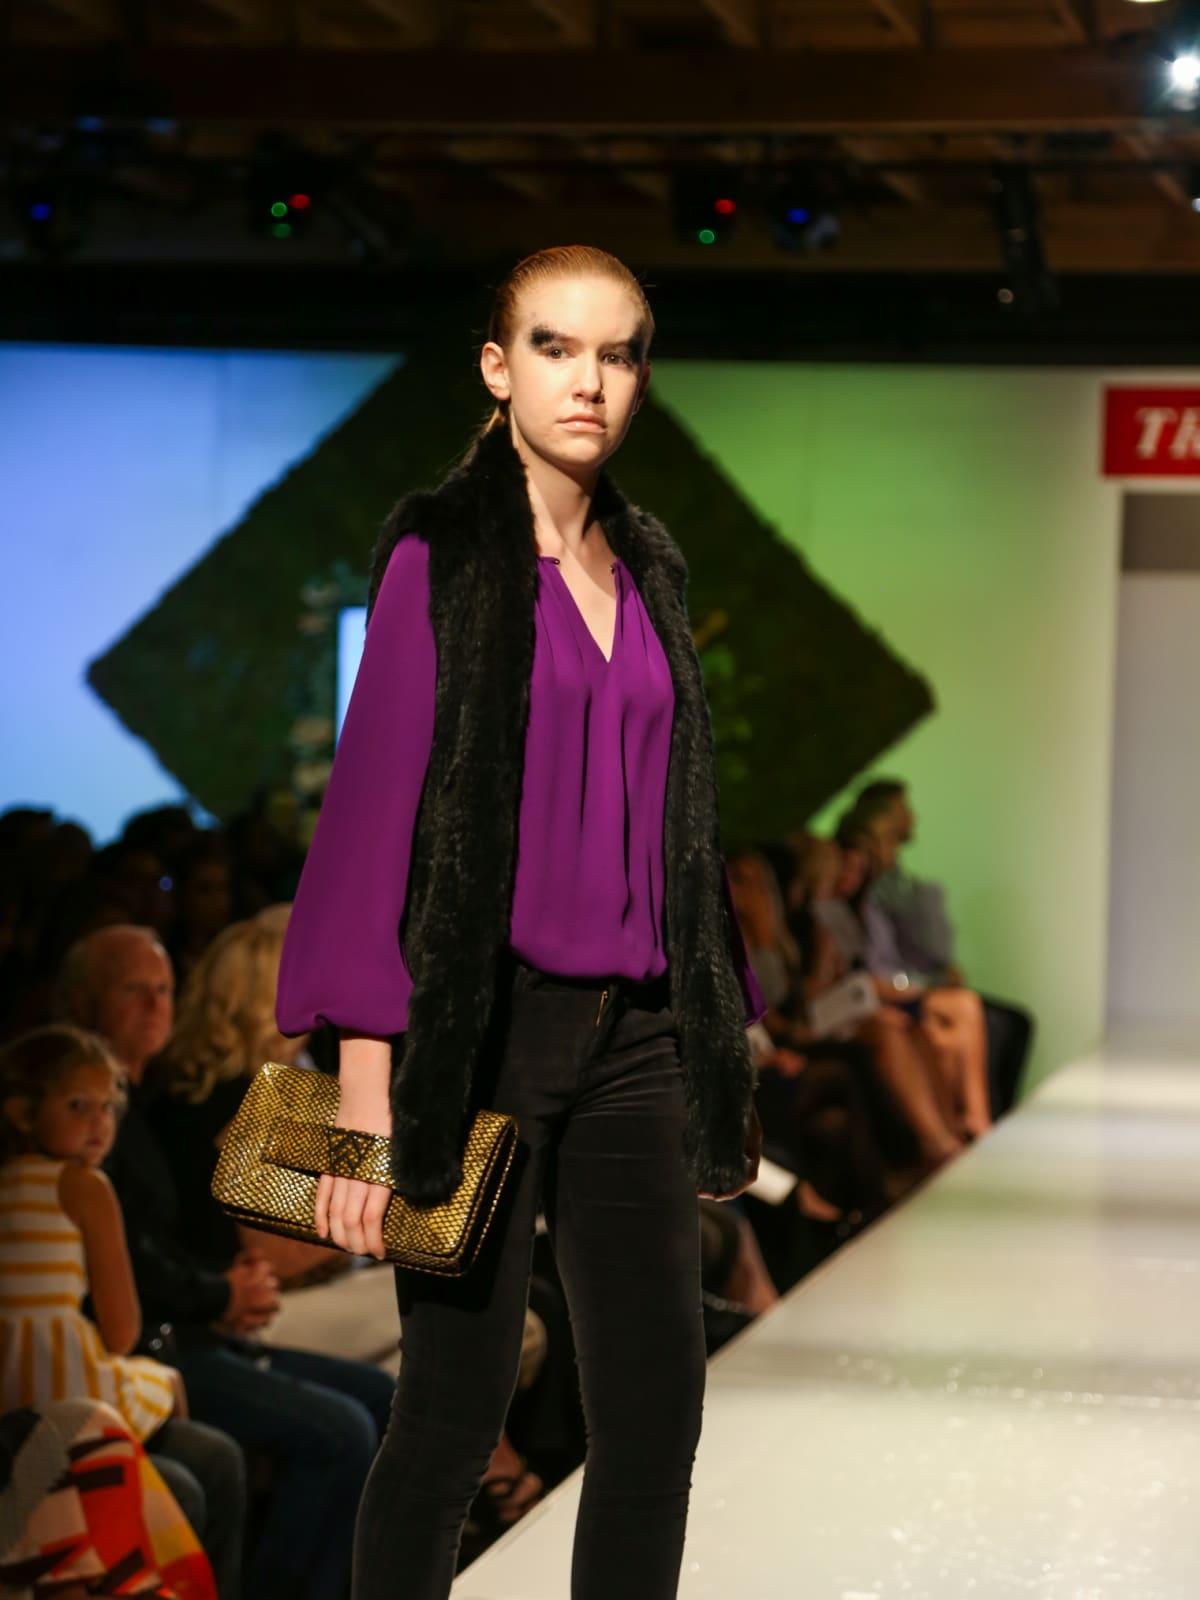 Tribeza Fashion Show 2015 at Brazos Hall FOUND Austin